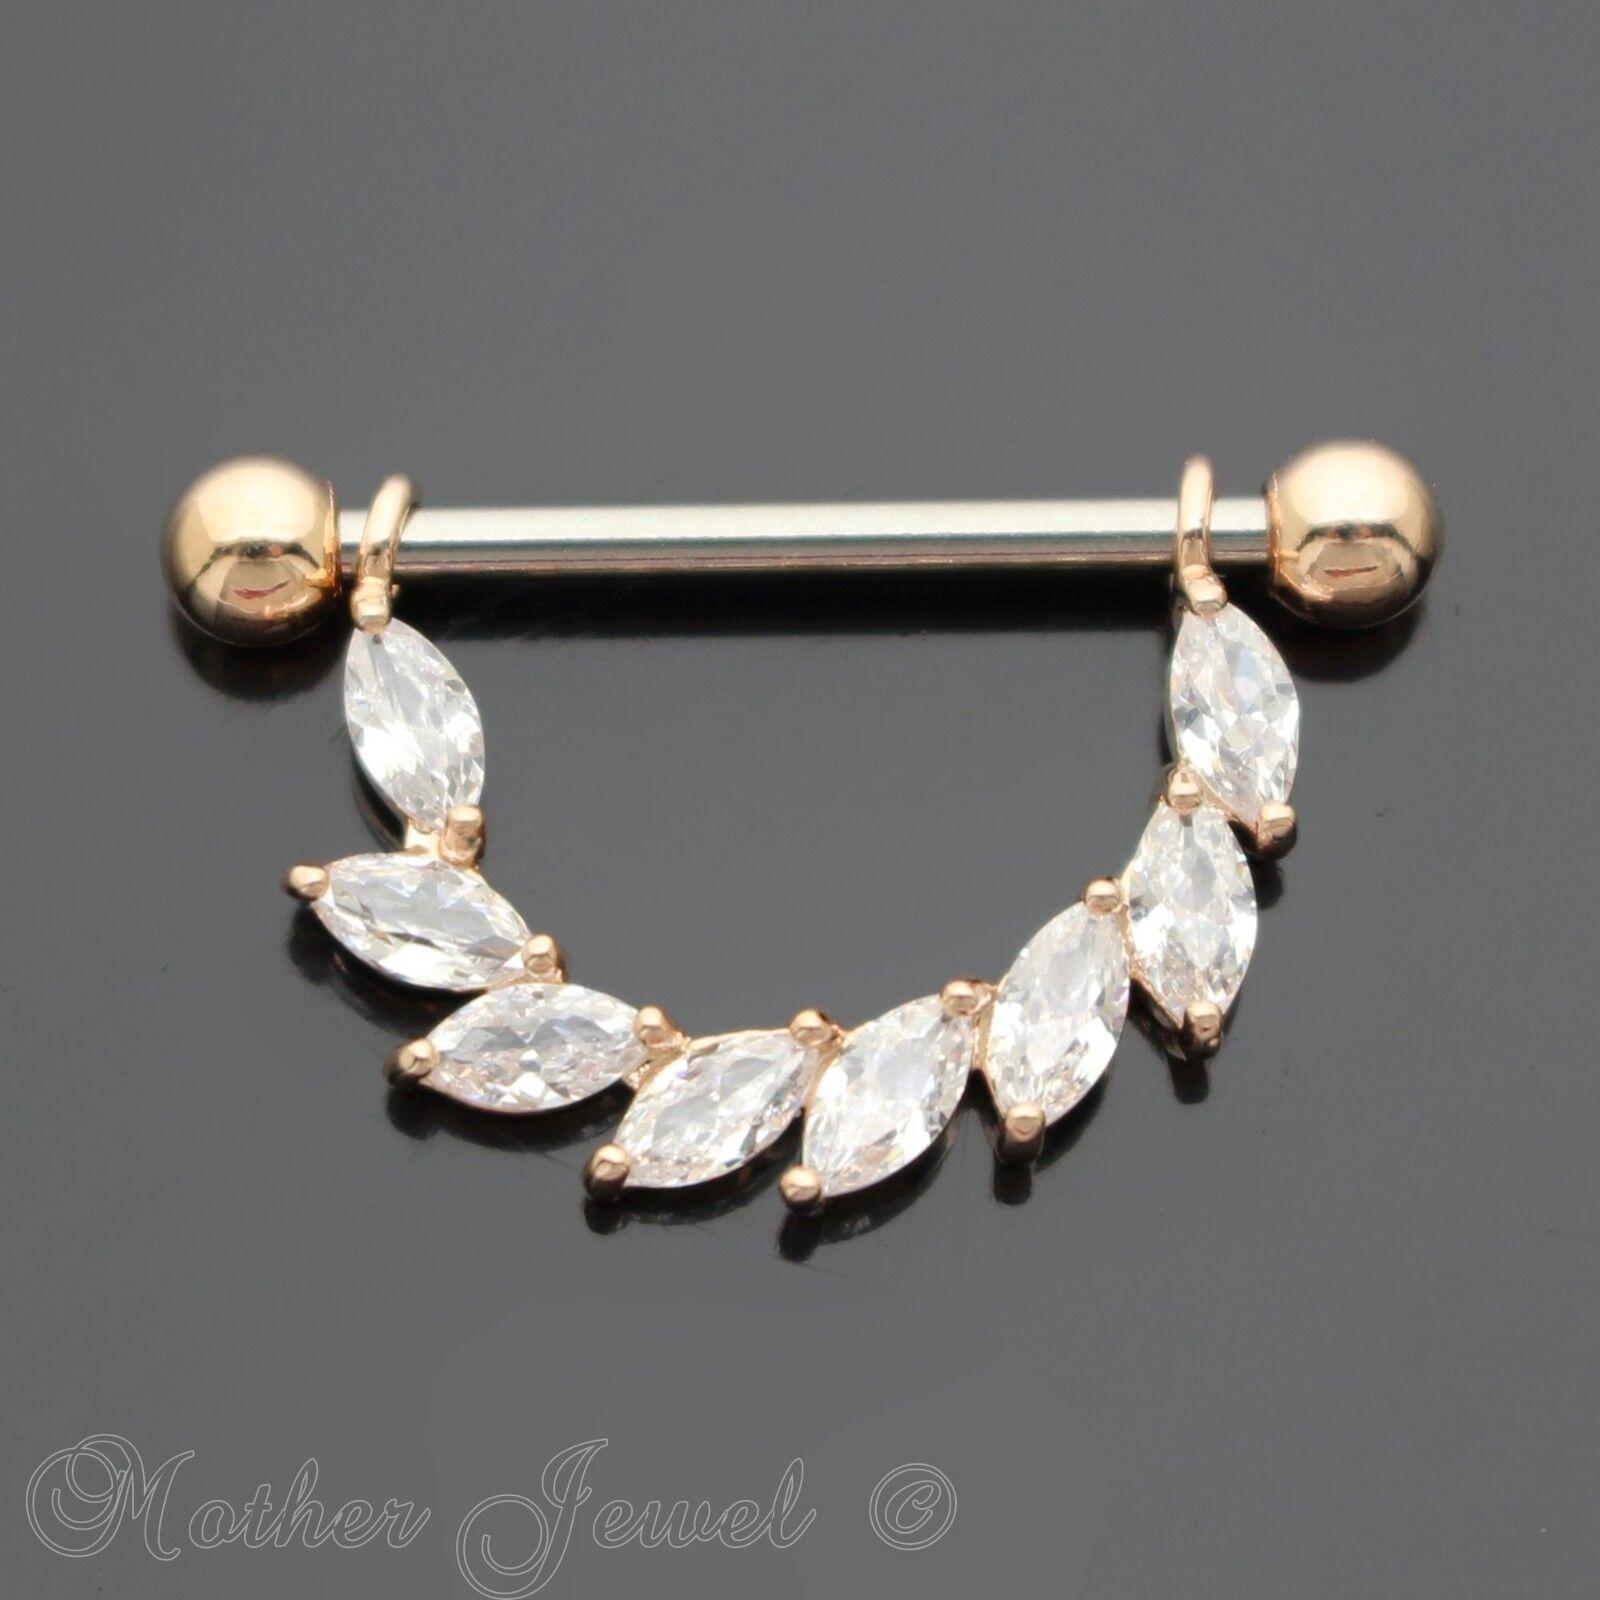 SILVER SURGICAL STEEL SIMULATED DIAMOND 14G DOUBLE PLAYBOY BUNNY NIPPLE 11MM BAR